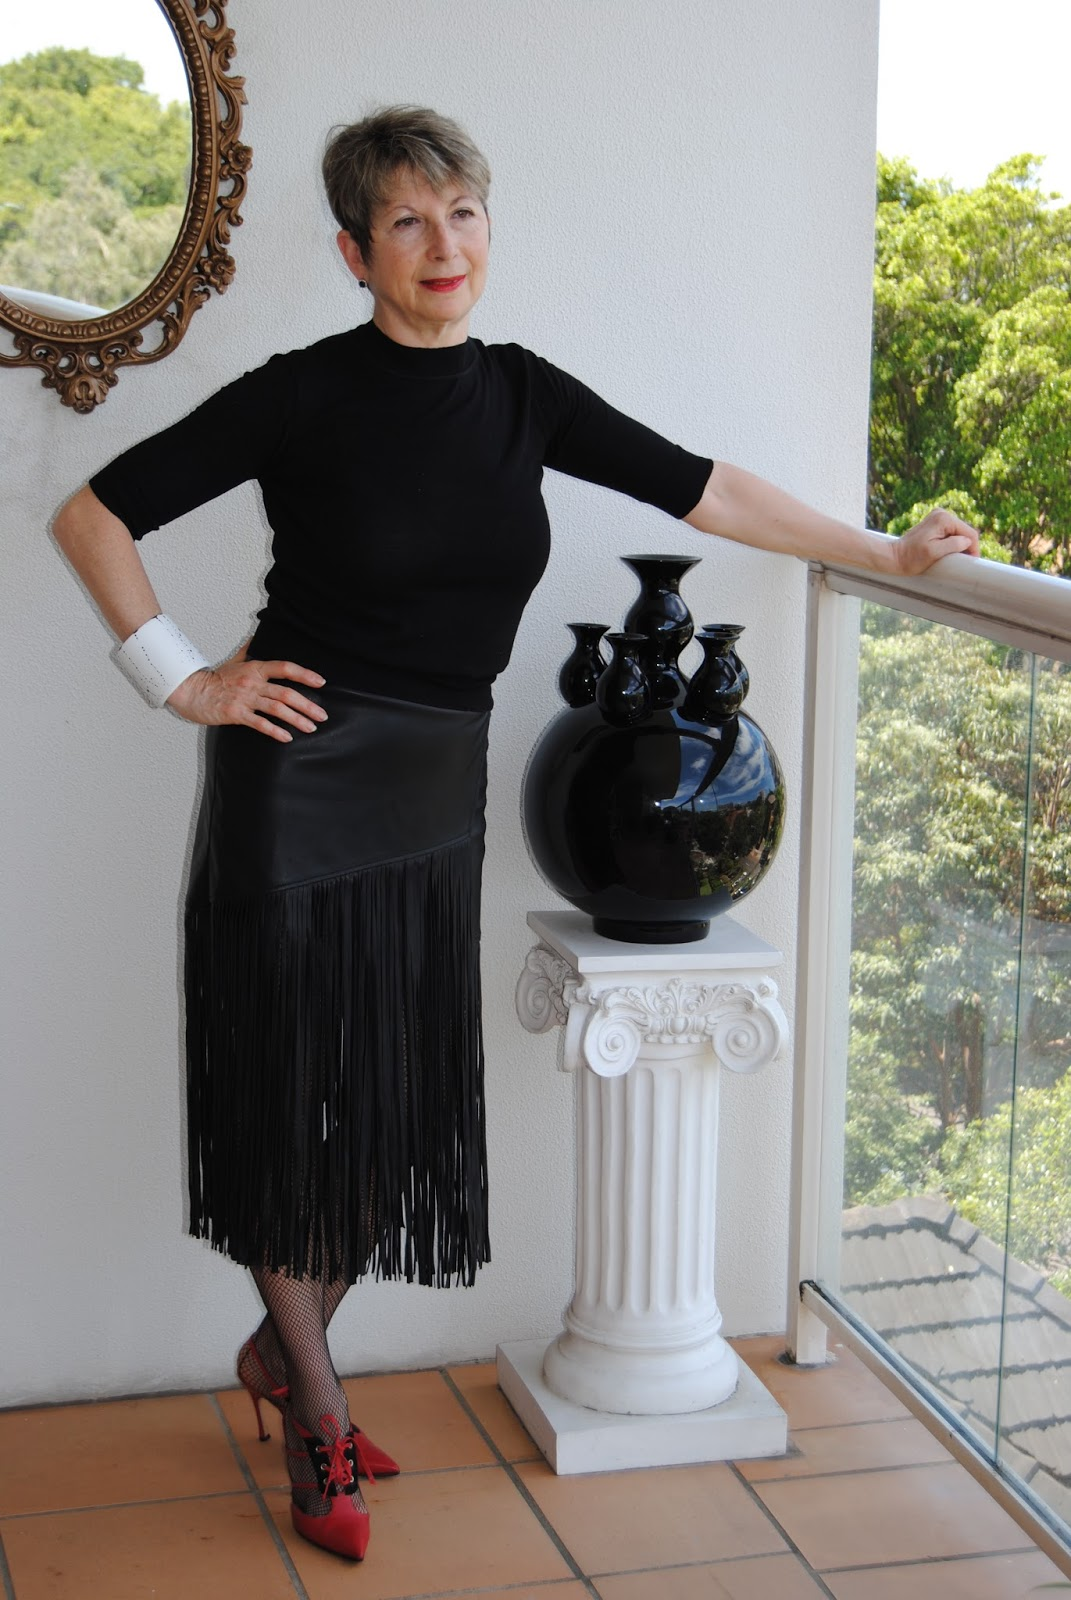 stockings skirt Mature leather